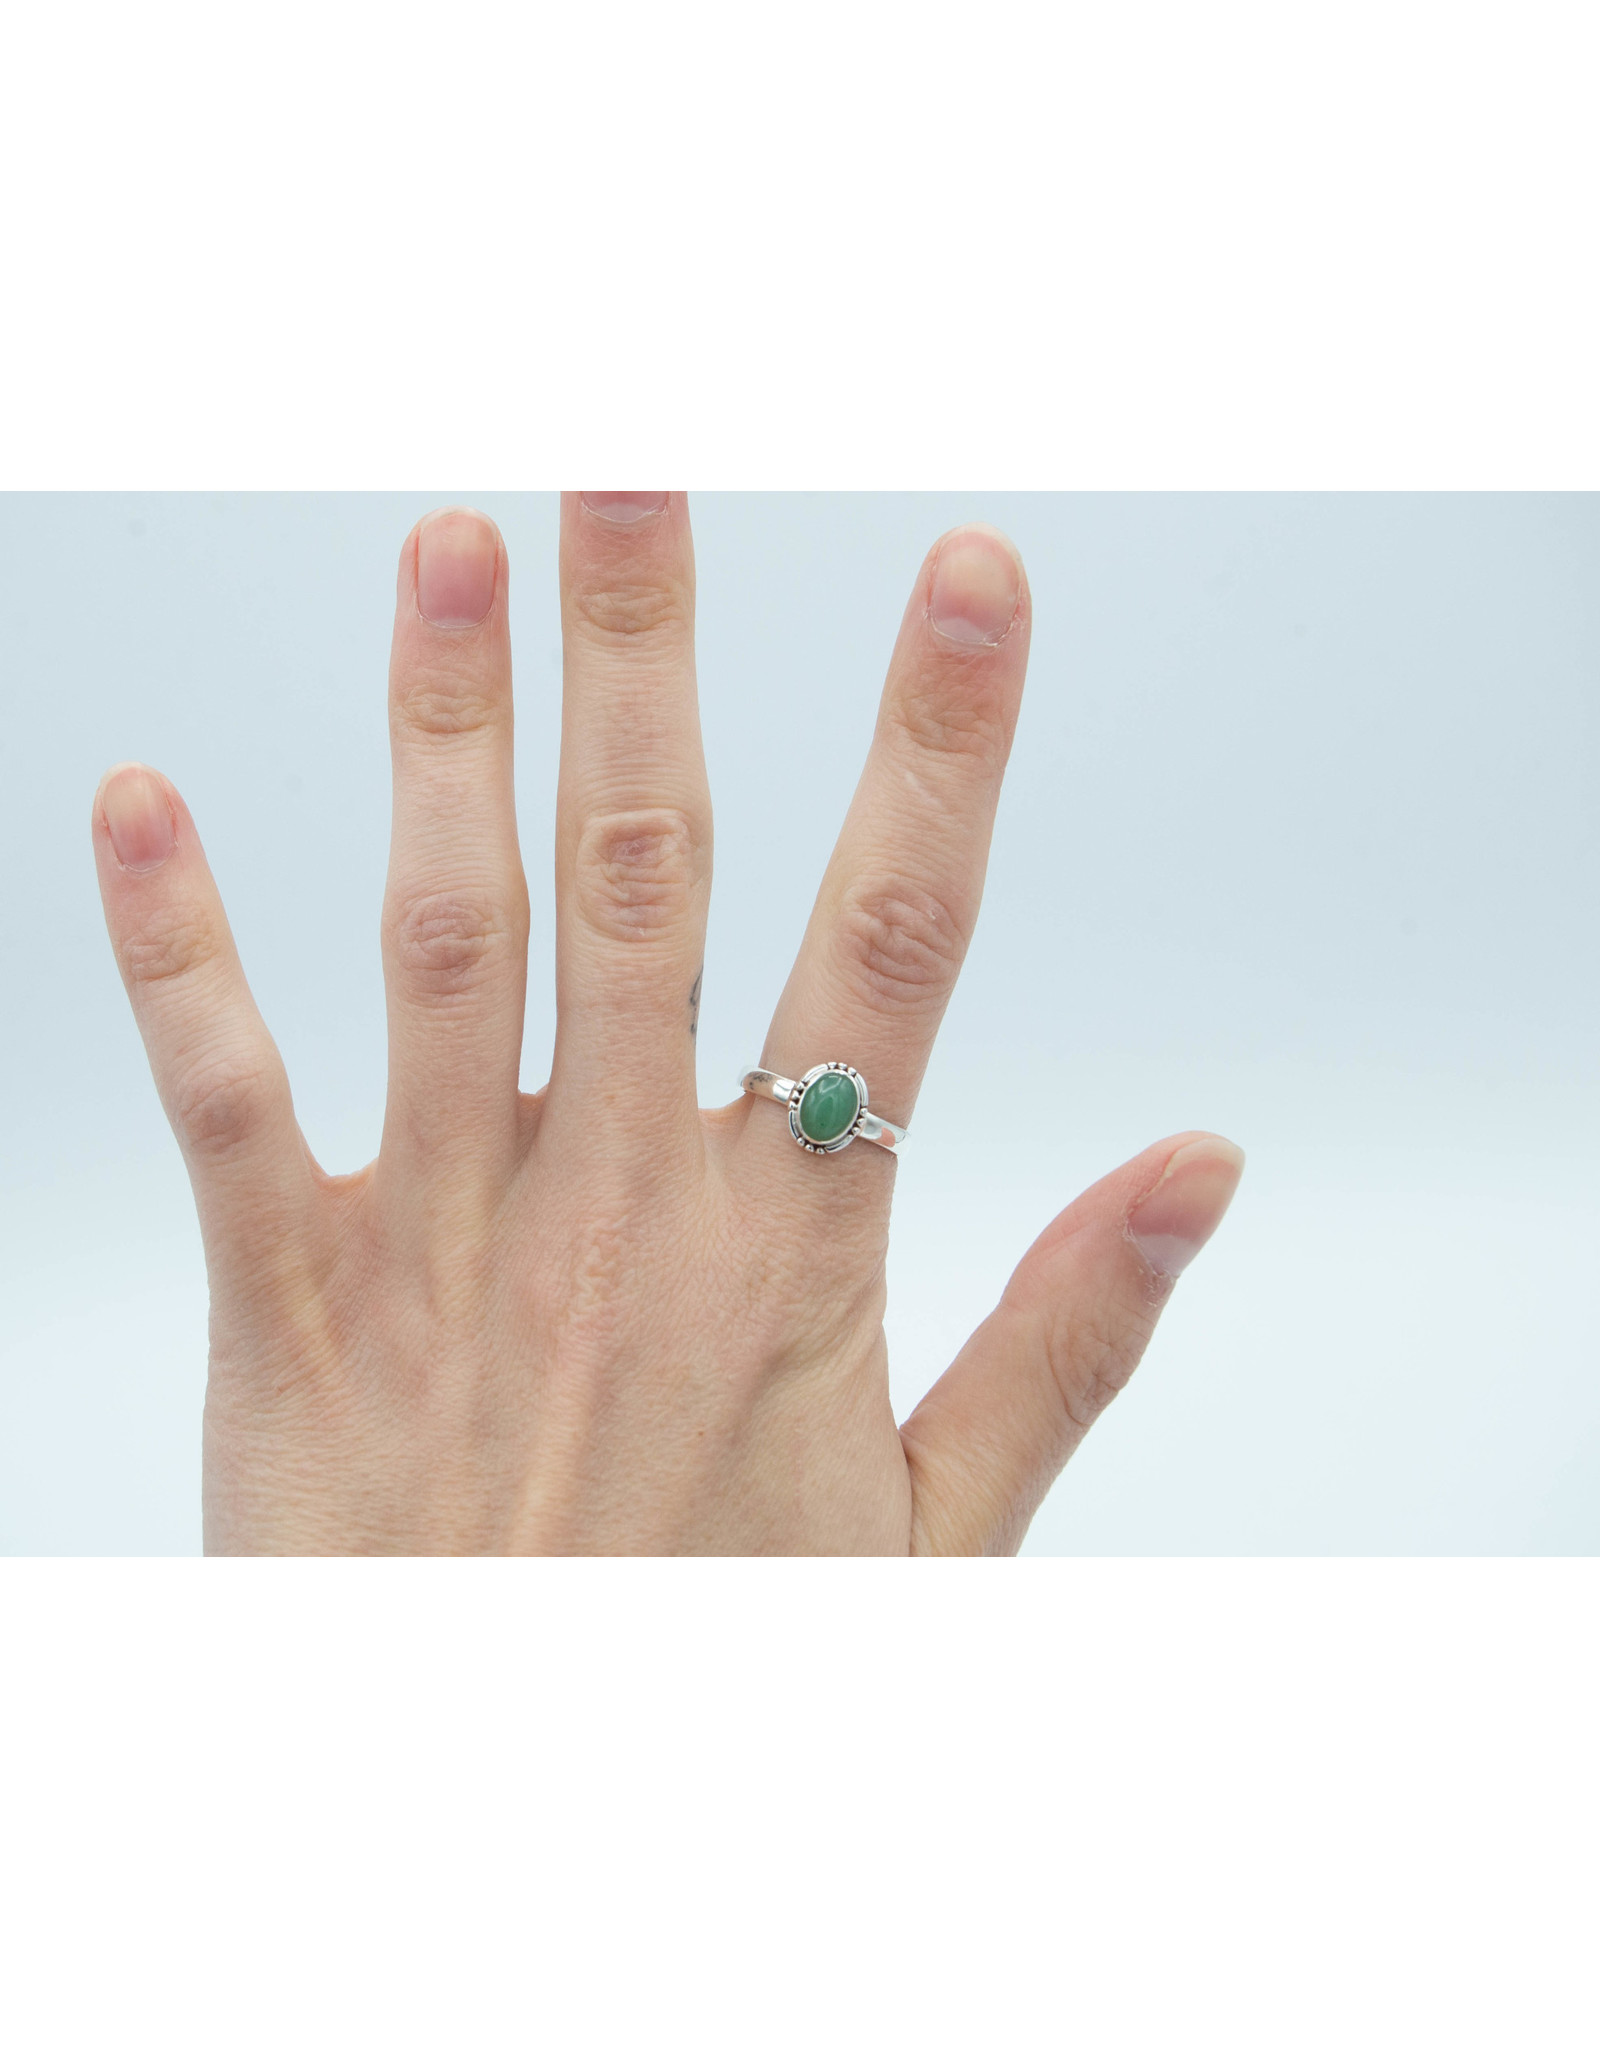 Green Aventurine Ring